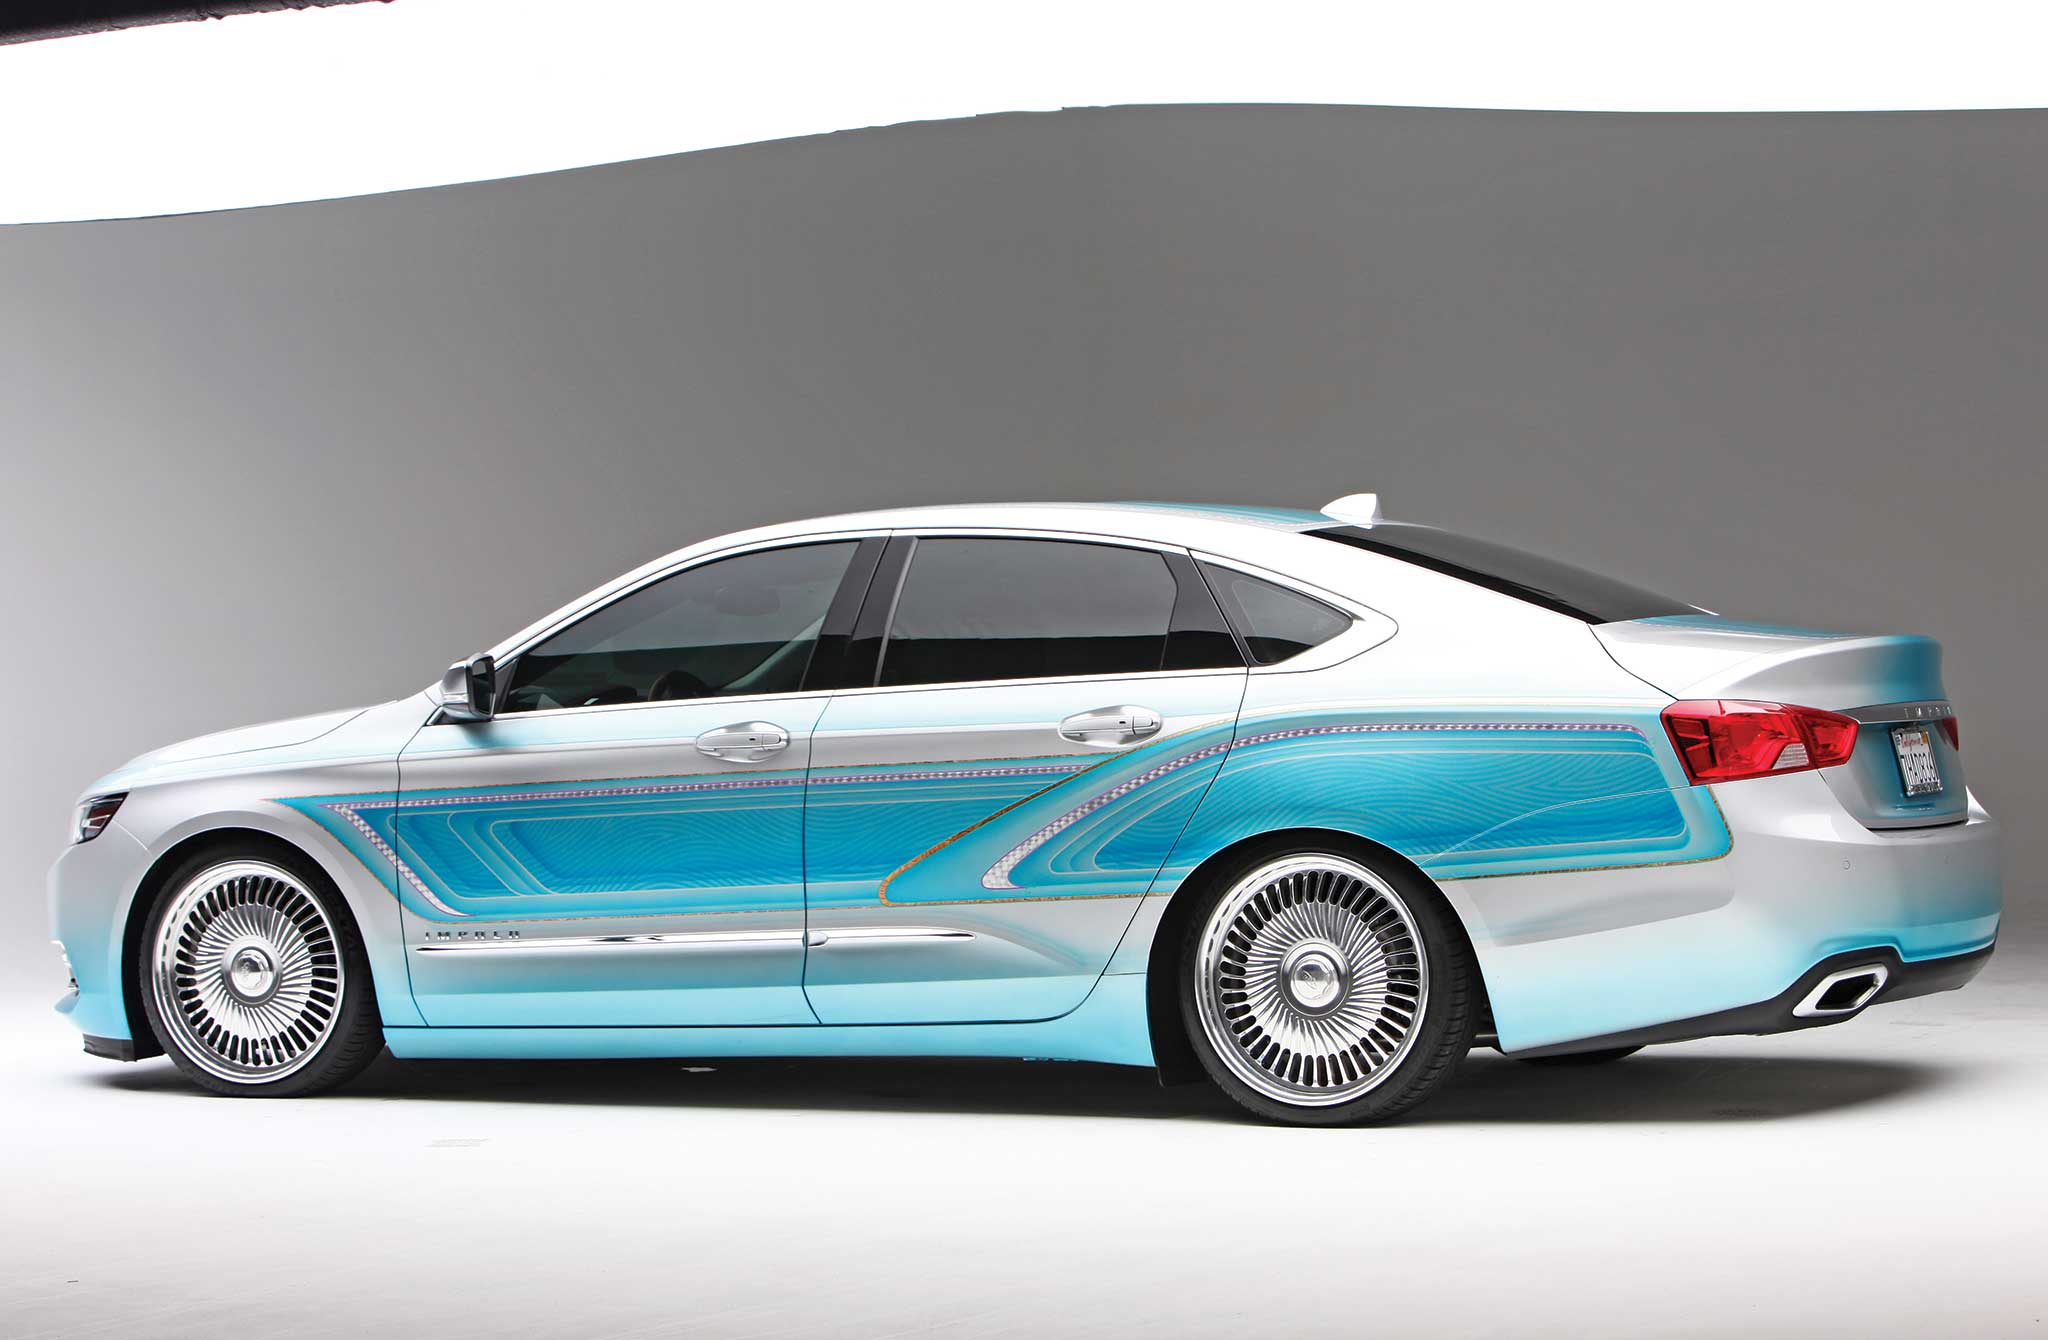 001 2014 chevrolet impala custom graphics